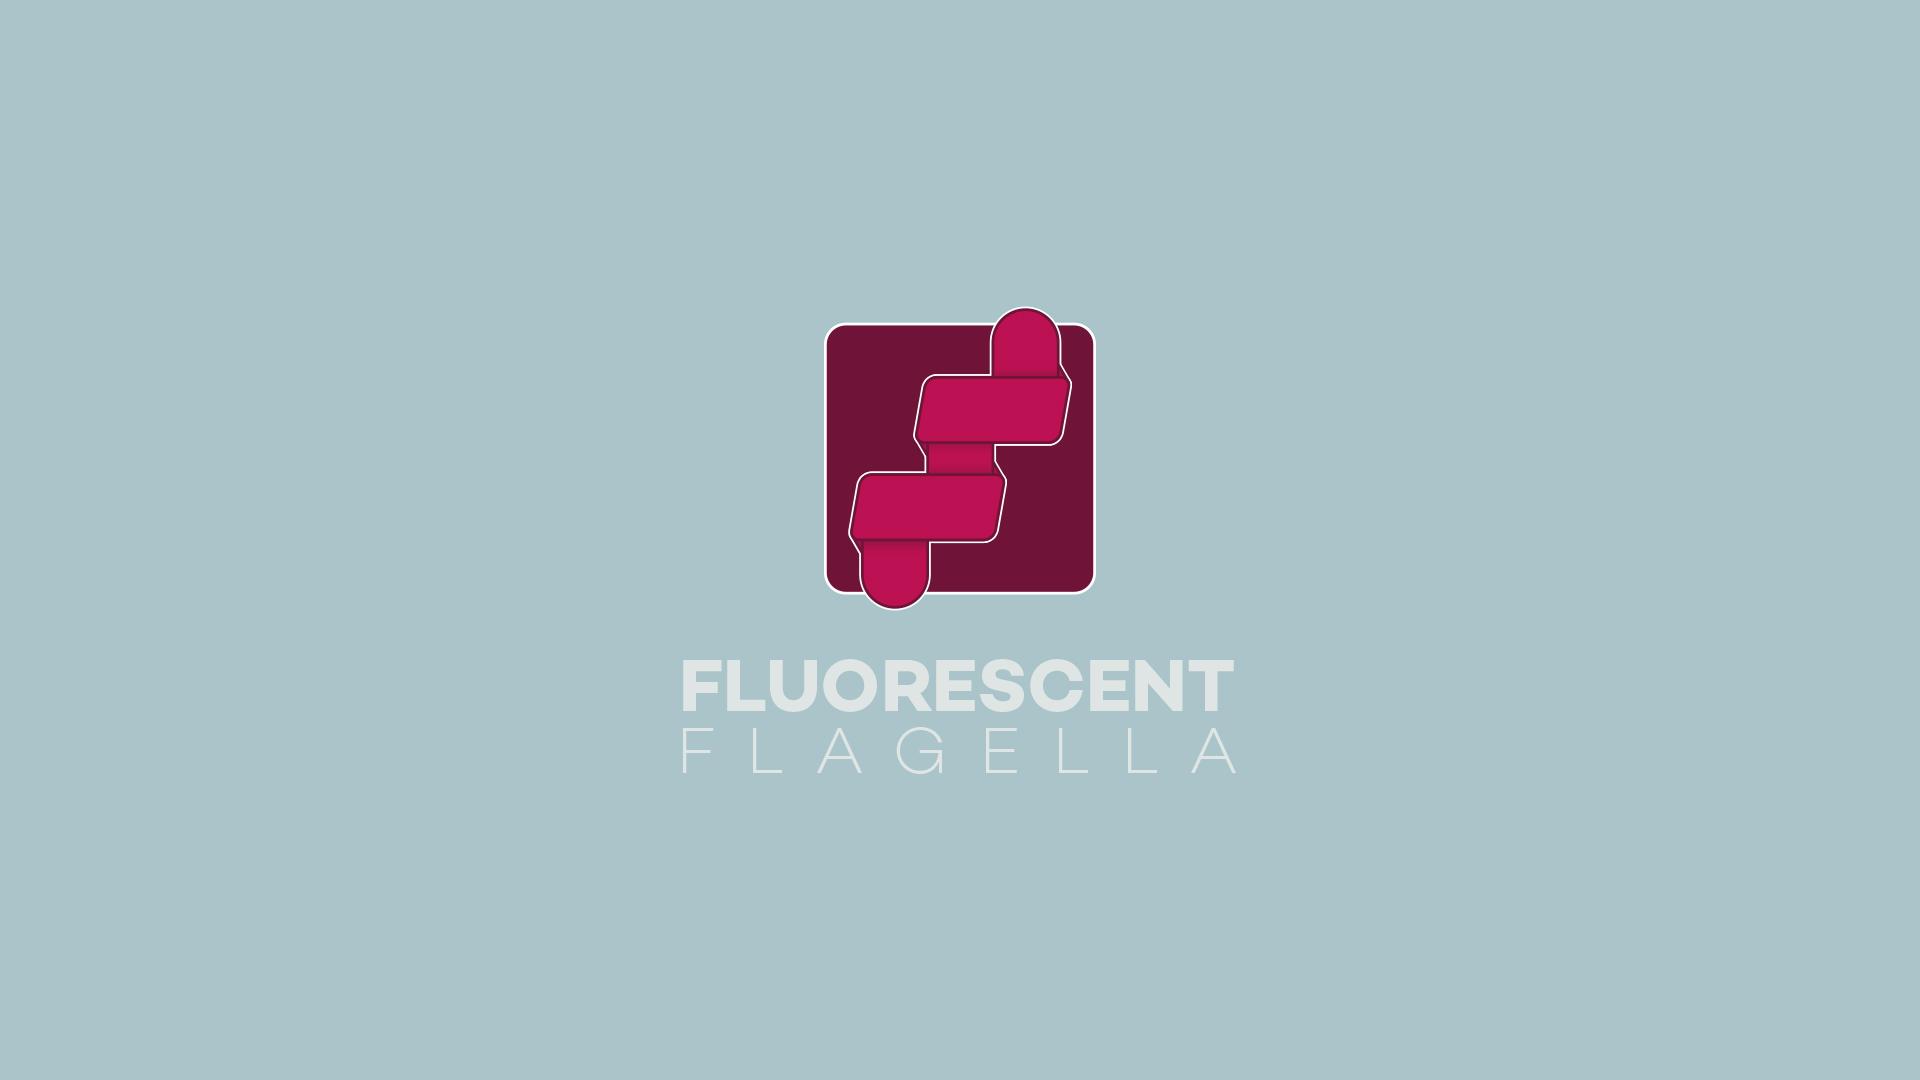 FluorescentFlagellaMockup2.jpg